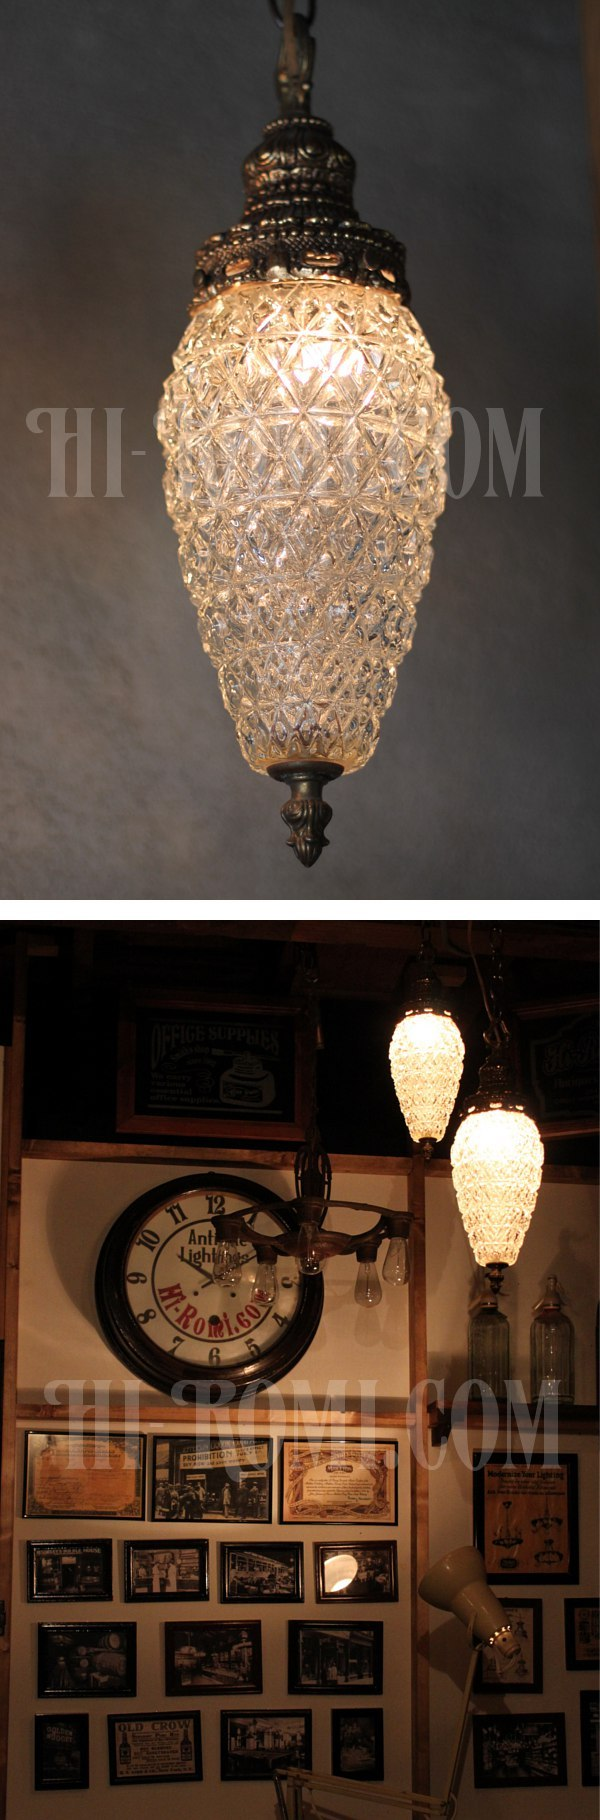 USAヴィンテージクリアプレスガラススワッグペンダントランプD/アンティークハンギング吊下げライト/ダイヤ型